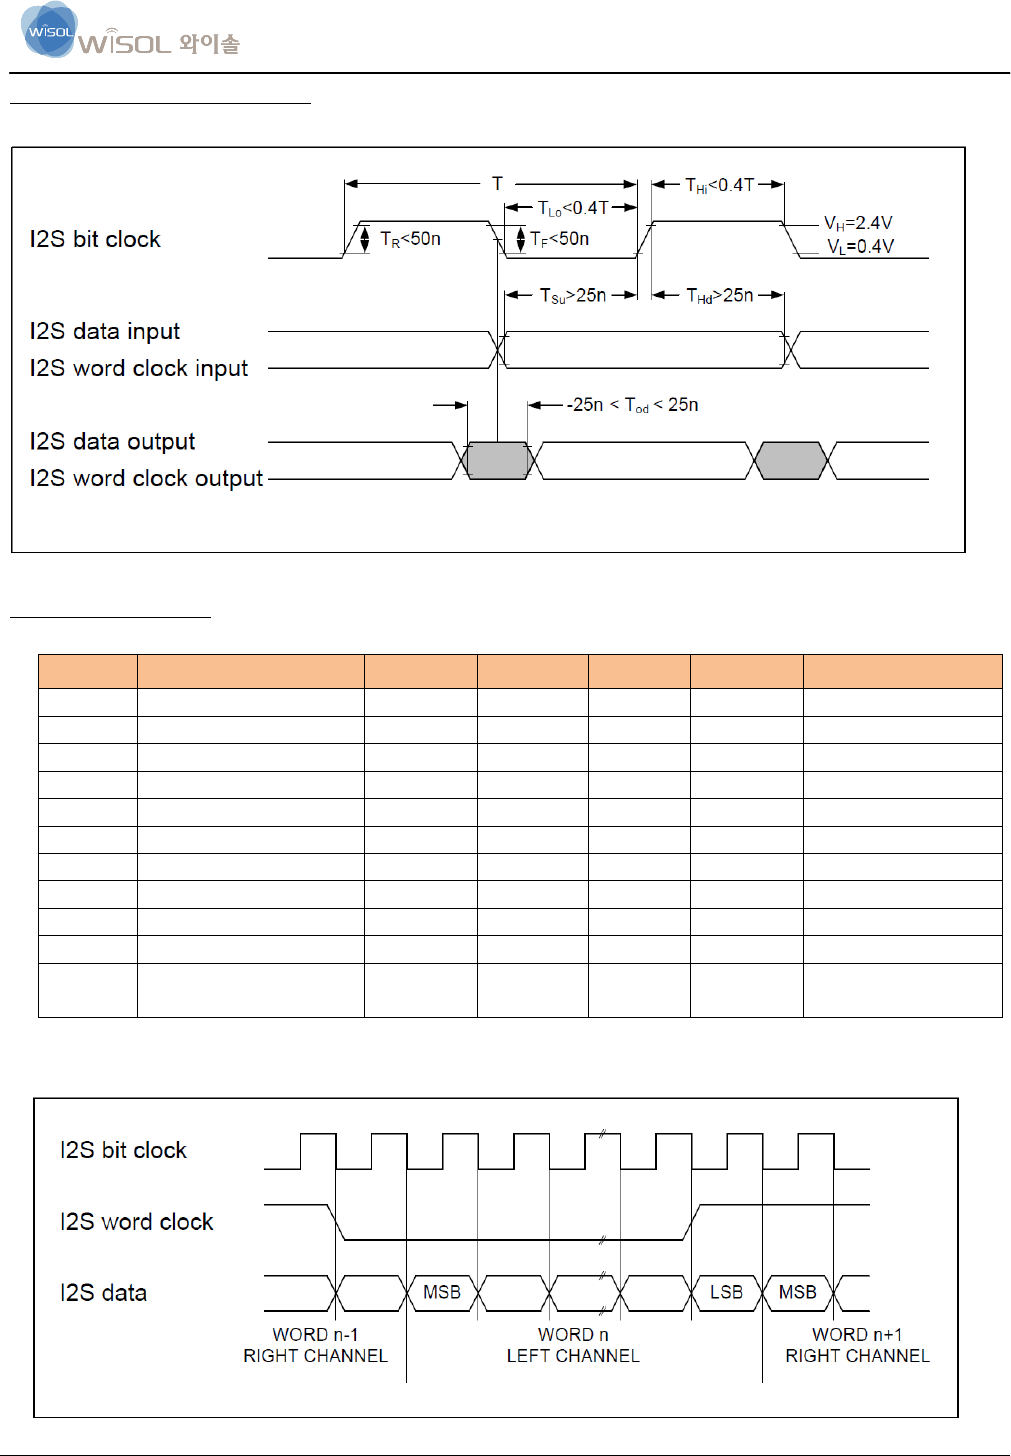 Wisol Atm100 Audio Transceiver User Manual Speaker Protection Circuit 2pcb Schematic Delay